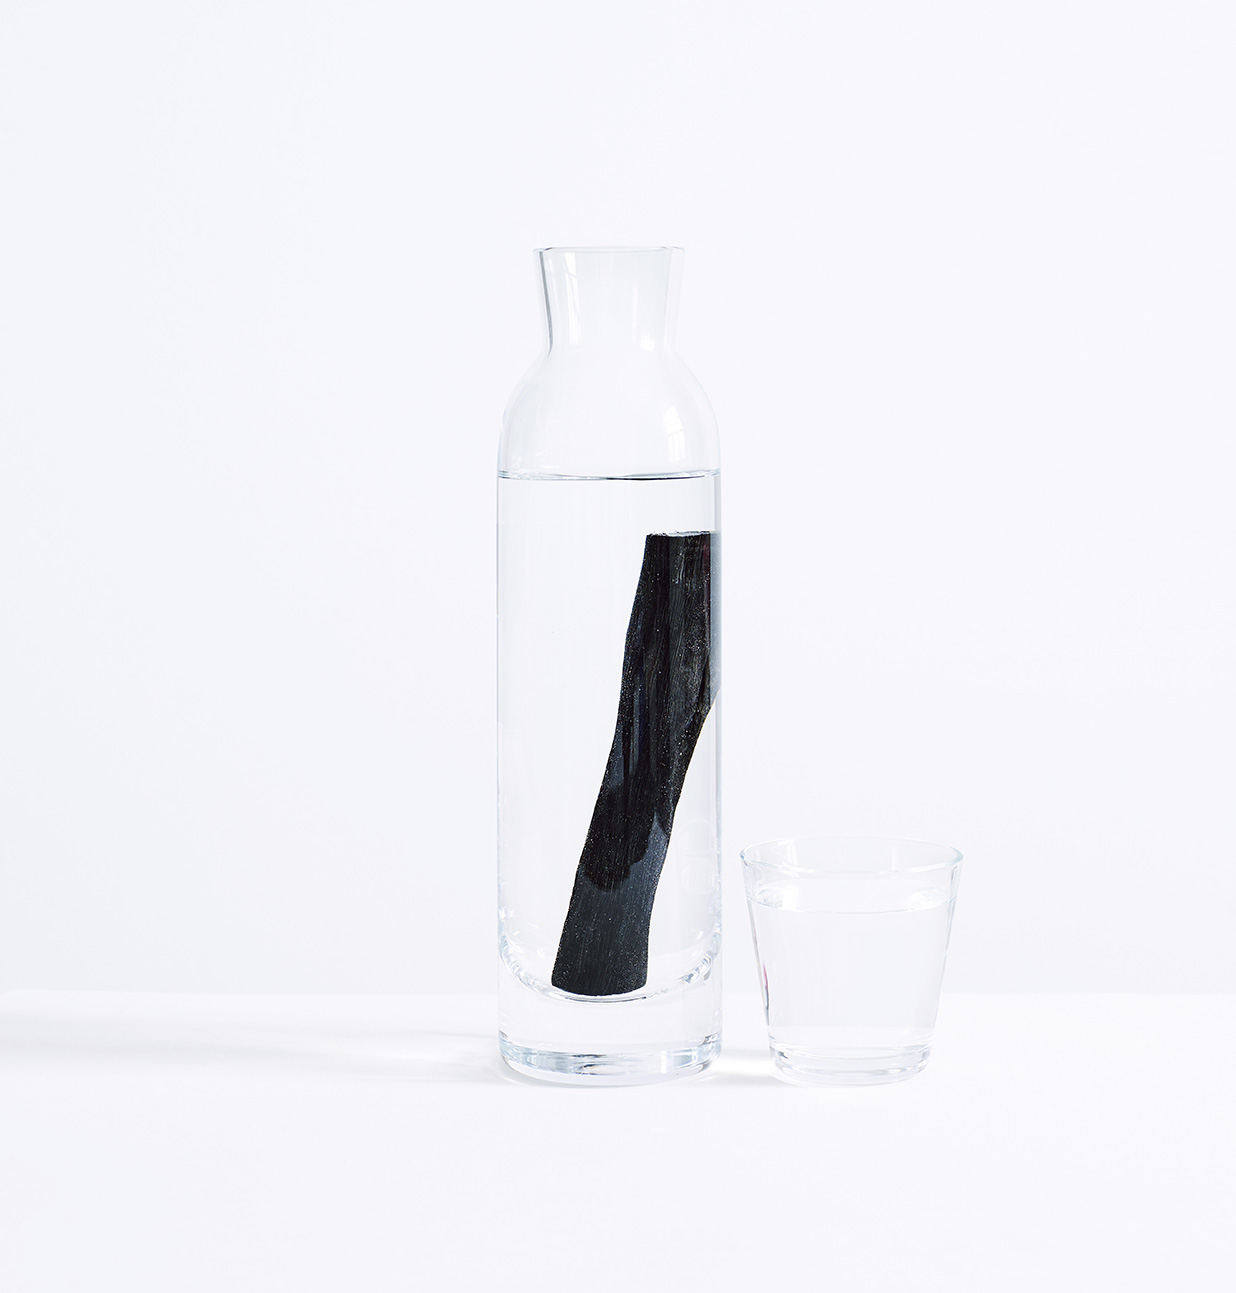 Kishu Water-Filter Charcoal Sticks (100% Biodegradable)